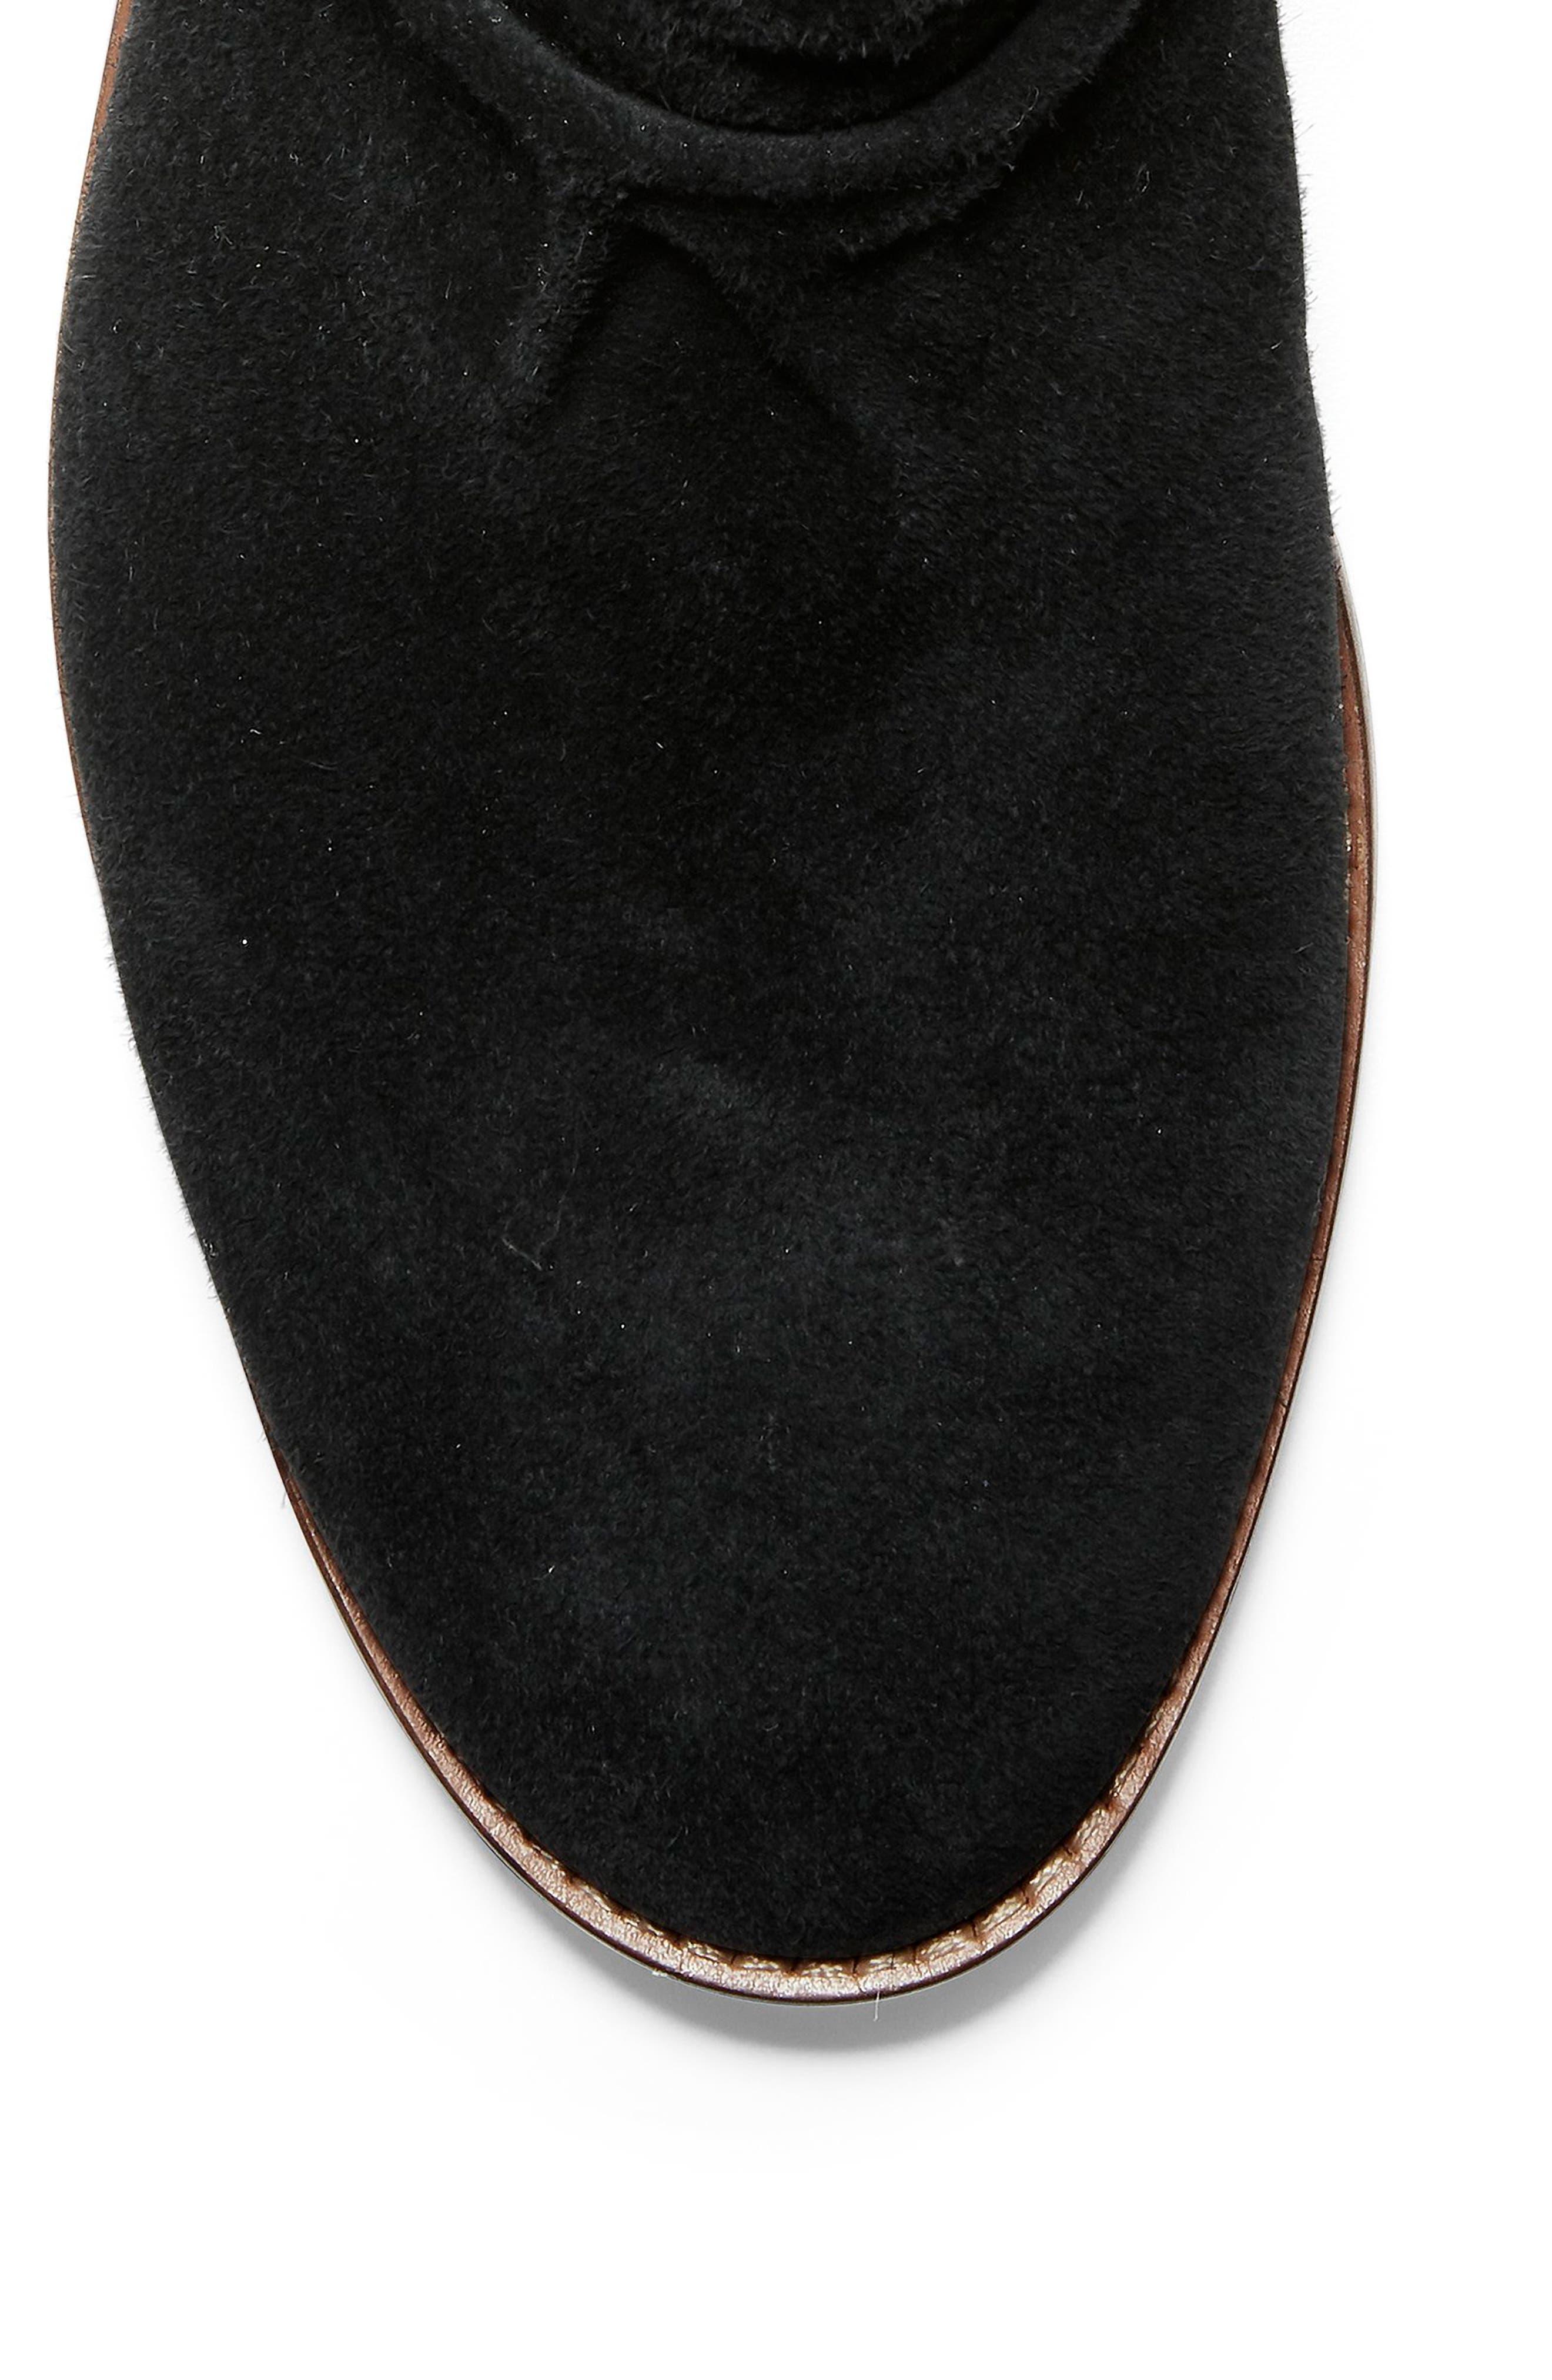 COLE HAAN, Harrington Grand Slouch Bootie, Alternate thumbnail 7, color, BLACK SUEDE